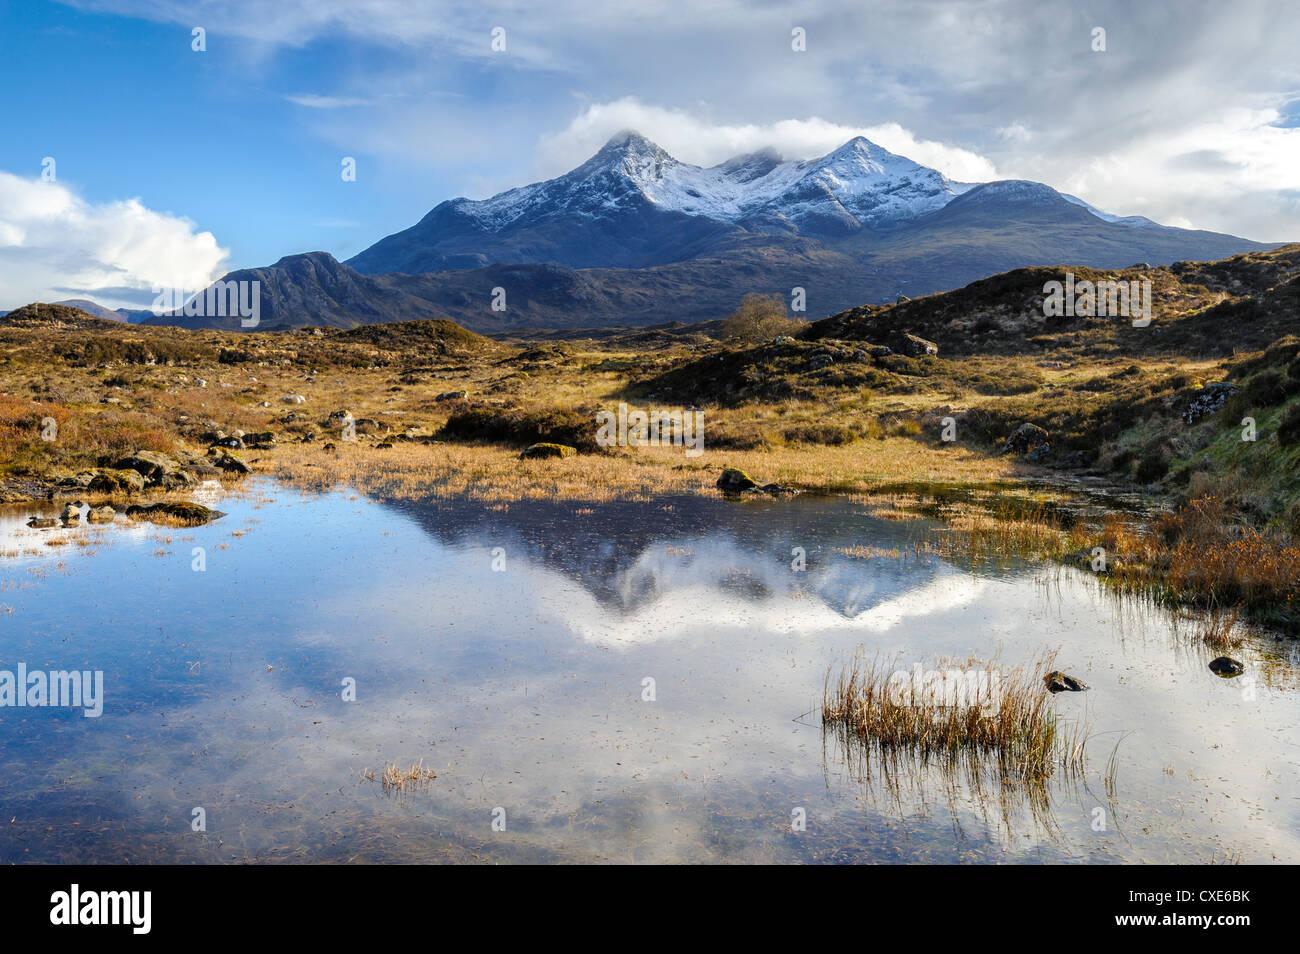 View of the Black Cuillin mountain Sgurr nan Gillean, Glen Sligachan, Isle of Skye, Scotland, United Kingdom, Europe - Stock Image